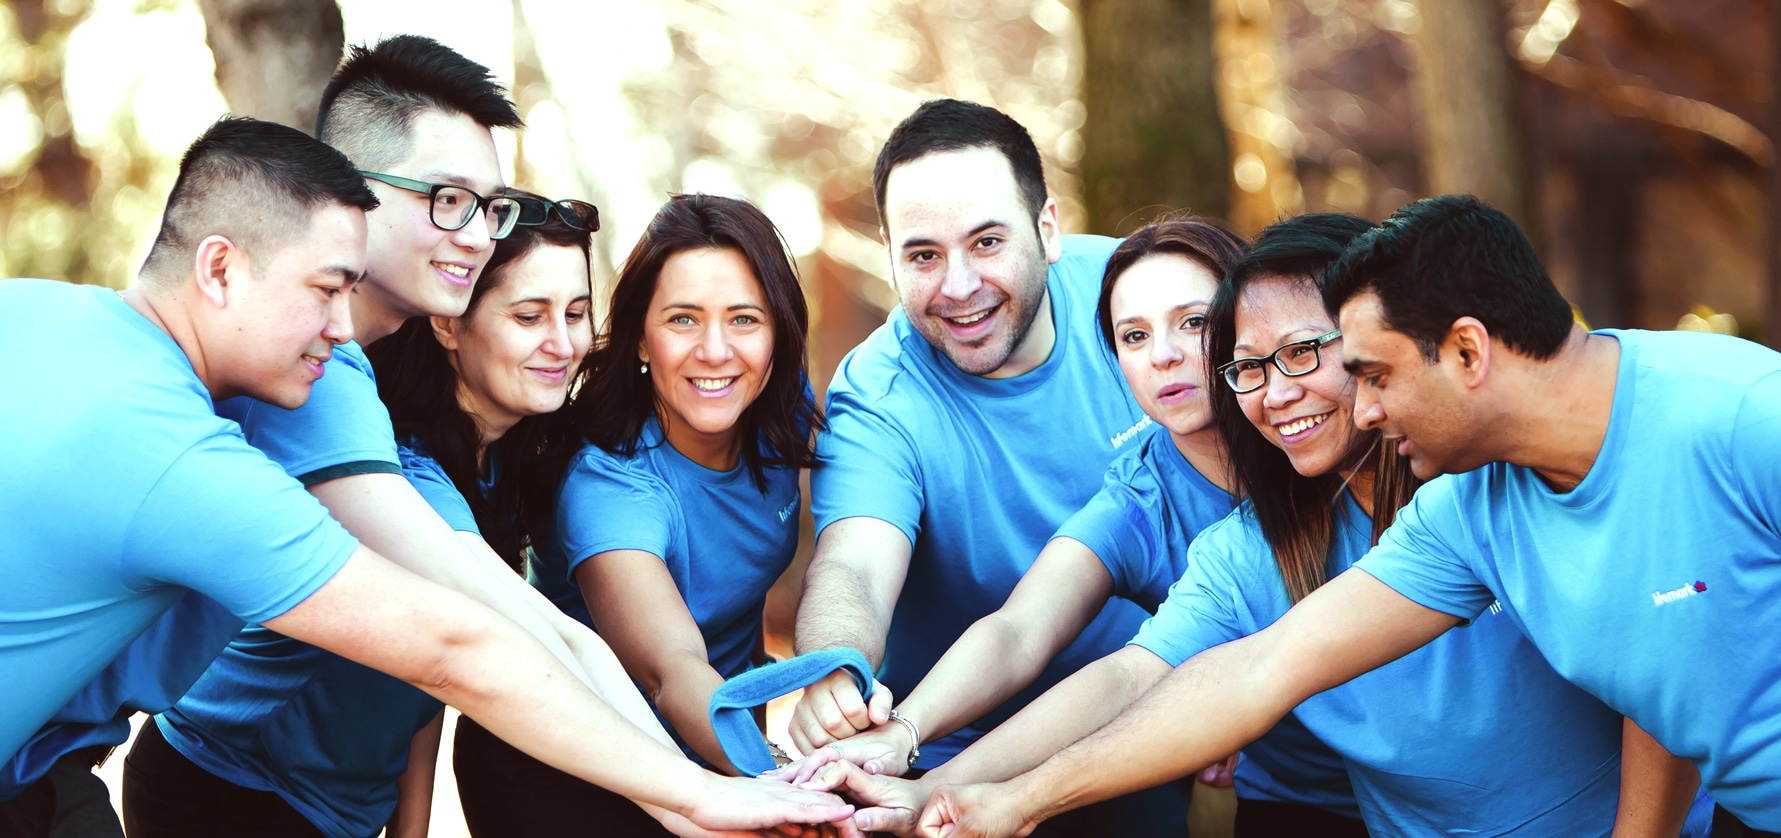 Lifemark Health Group